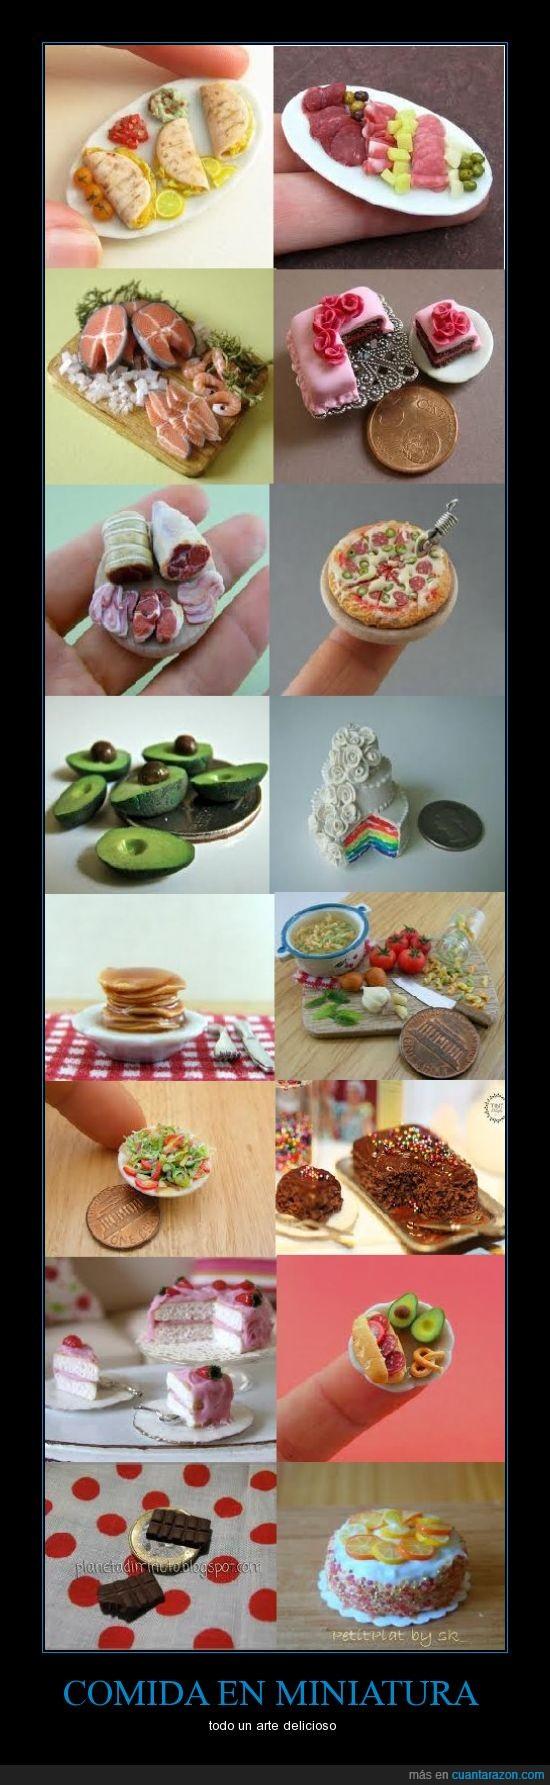 CR_720699_comida_en_miniatura